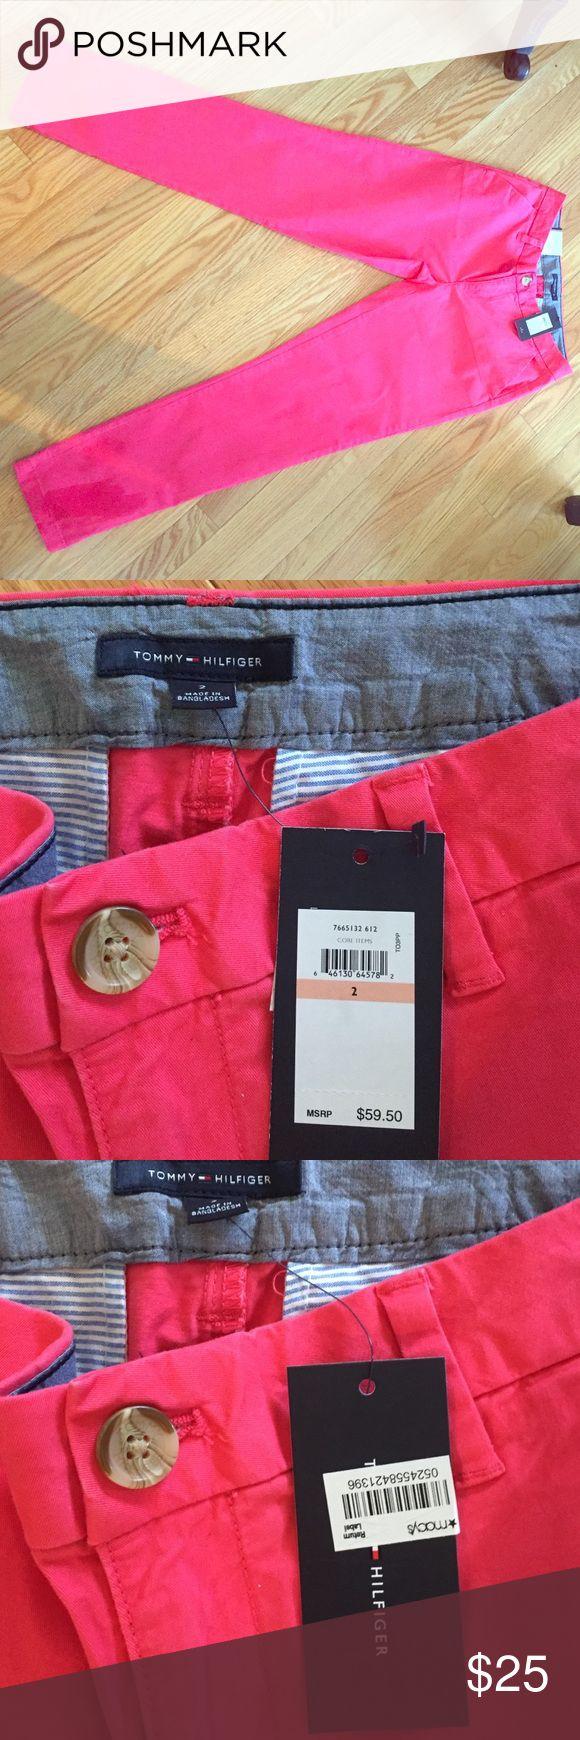 Tommy Hilfiger Ladies Chinos Hampton Style. Size 2. Never worn. 97% cotton. Tommy Hilfiger Pants Straight Leg